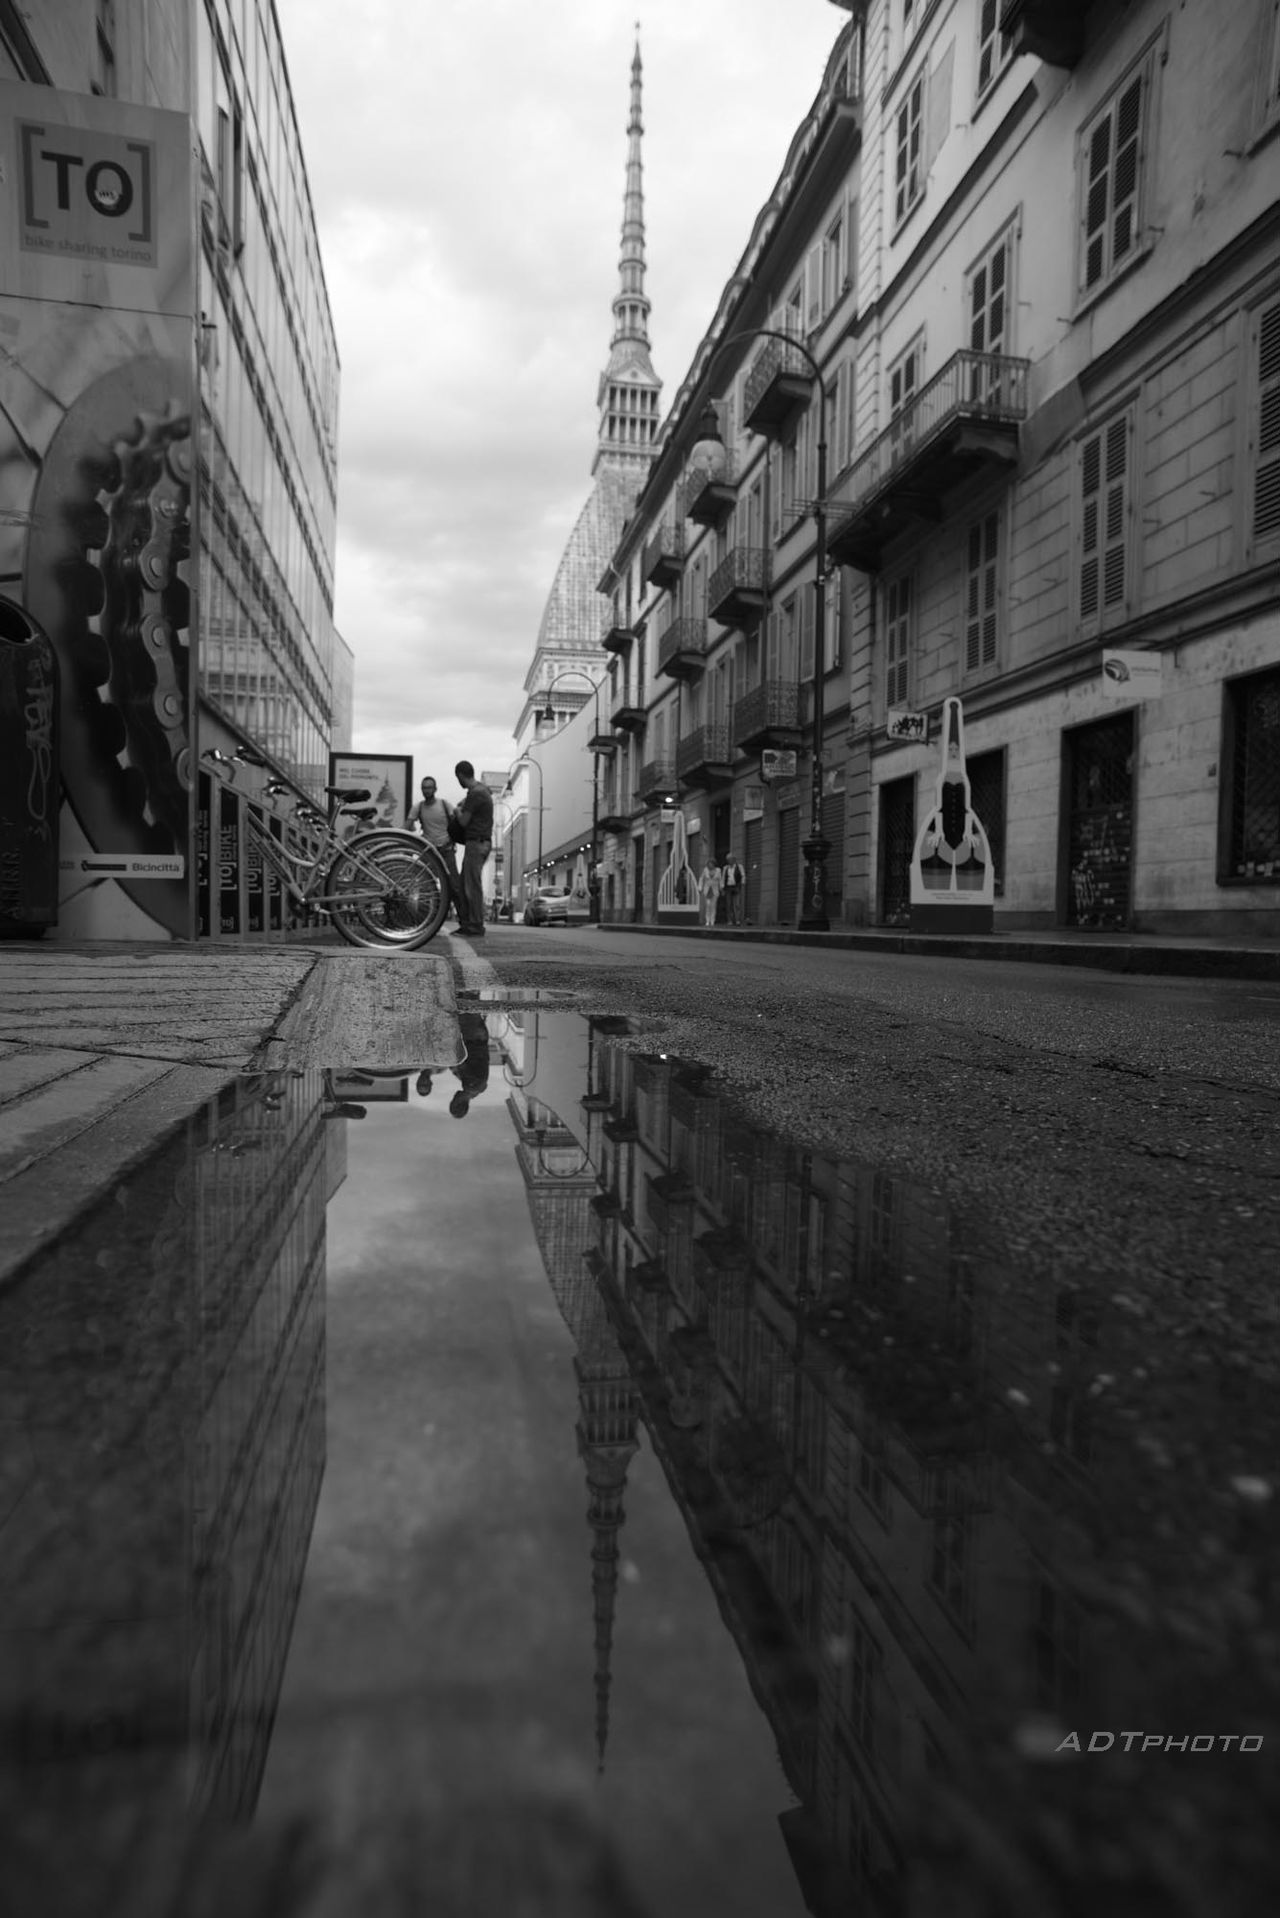 Mole Antonelliana Torino , La Mole Torino Reflection Reflecions In The Water Italy Black And White Streetphotography Street View After The Rain